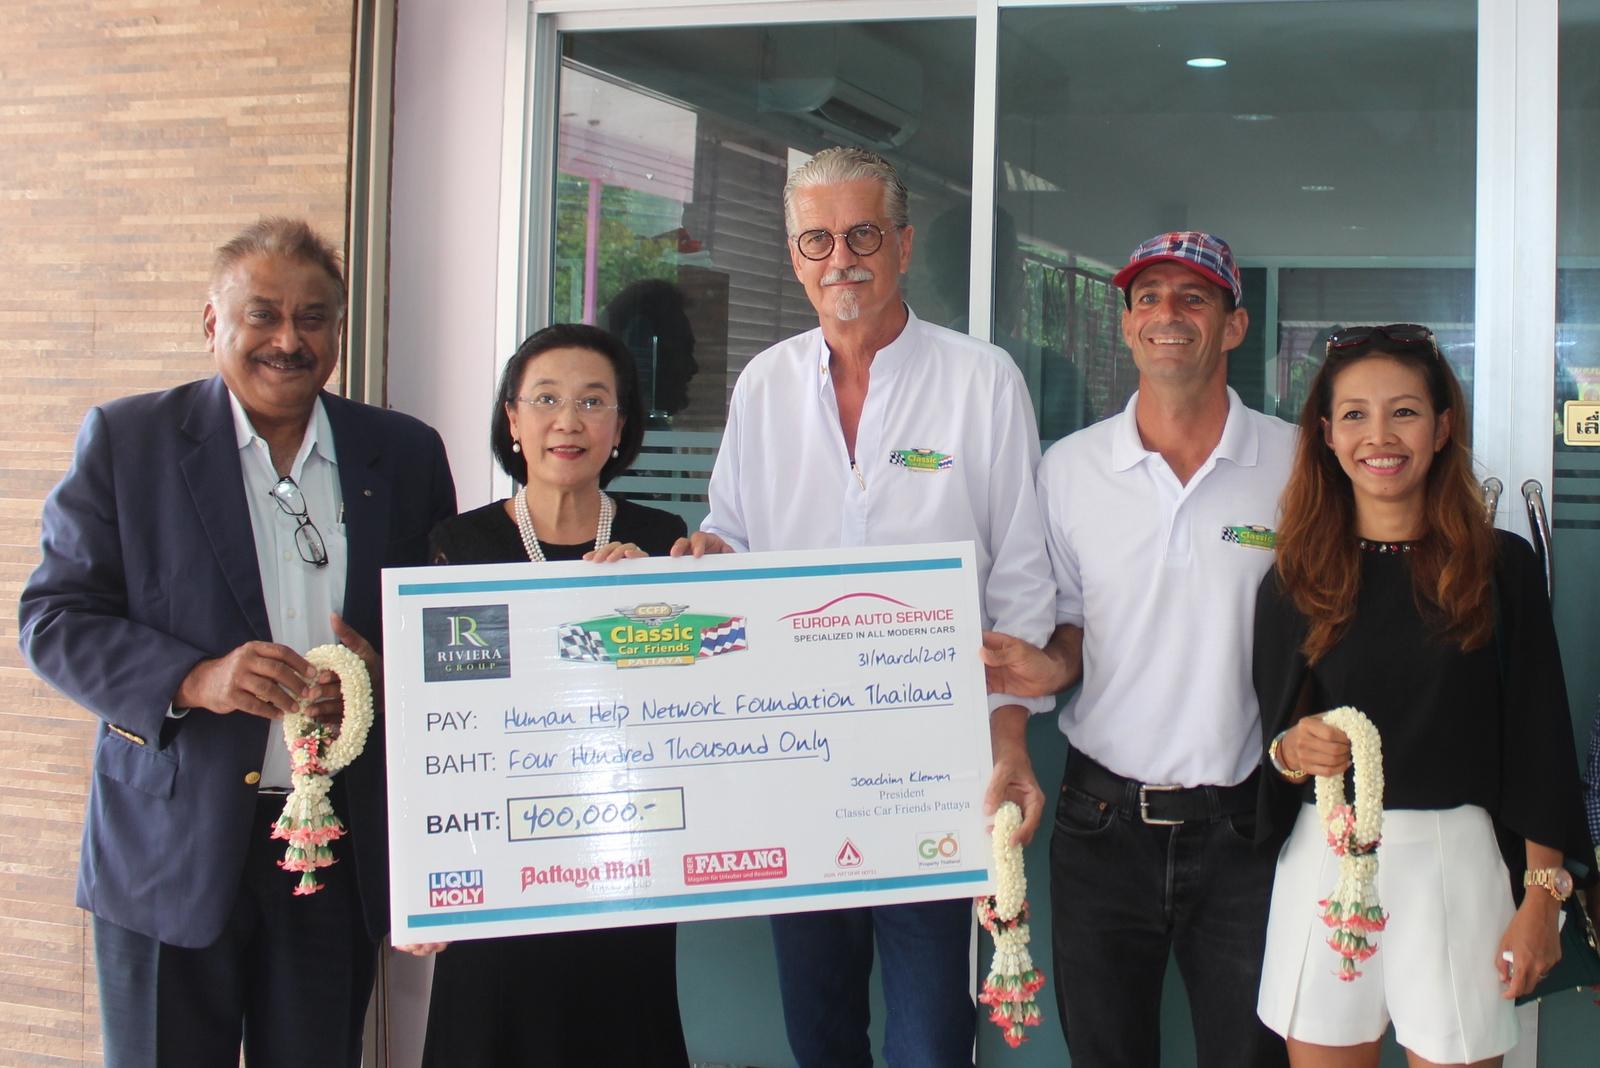 (l-r) Pratheep Malhotra media sponsor, Jo Klemm, Martin and Achara Koller hand over a check for 400,000 baht to Ratchada Chomjinda the Director of the Human Help Network Foundation.